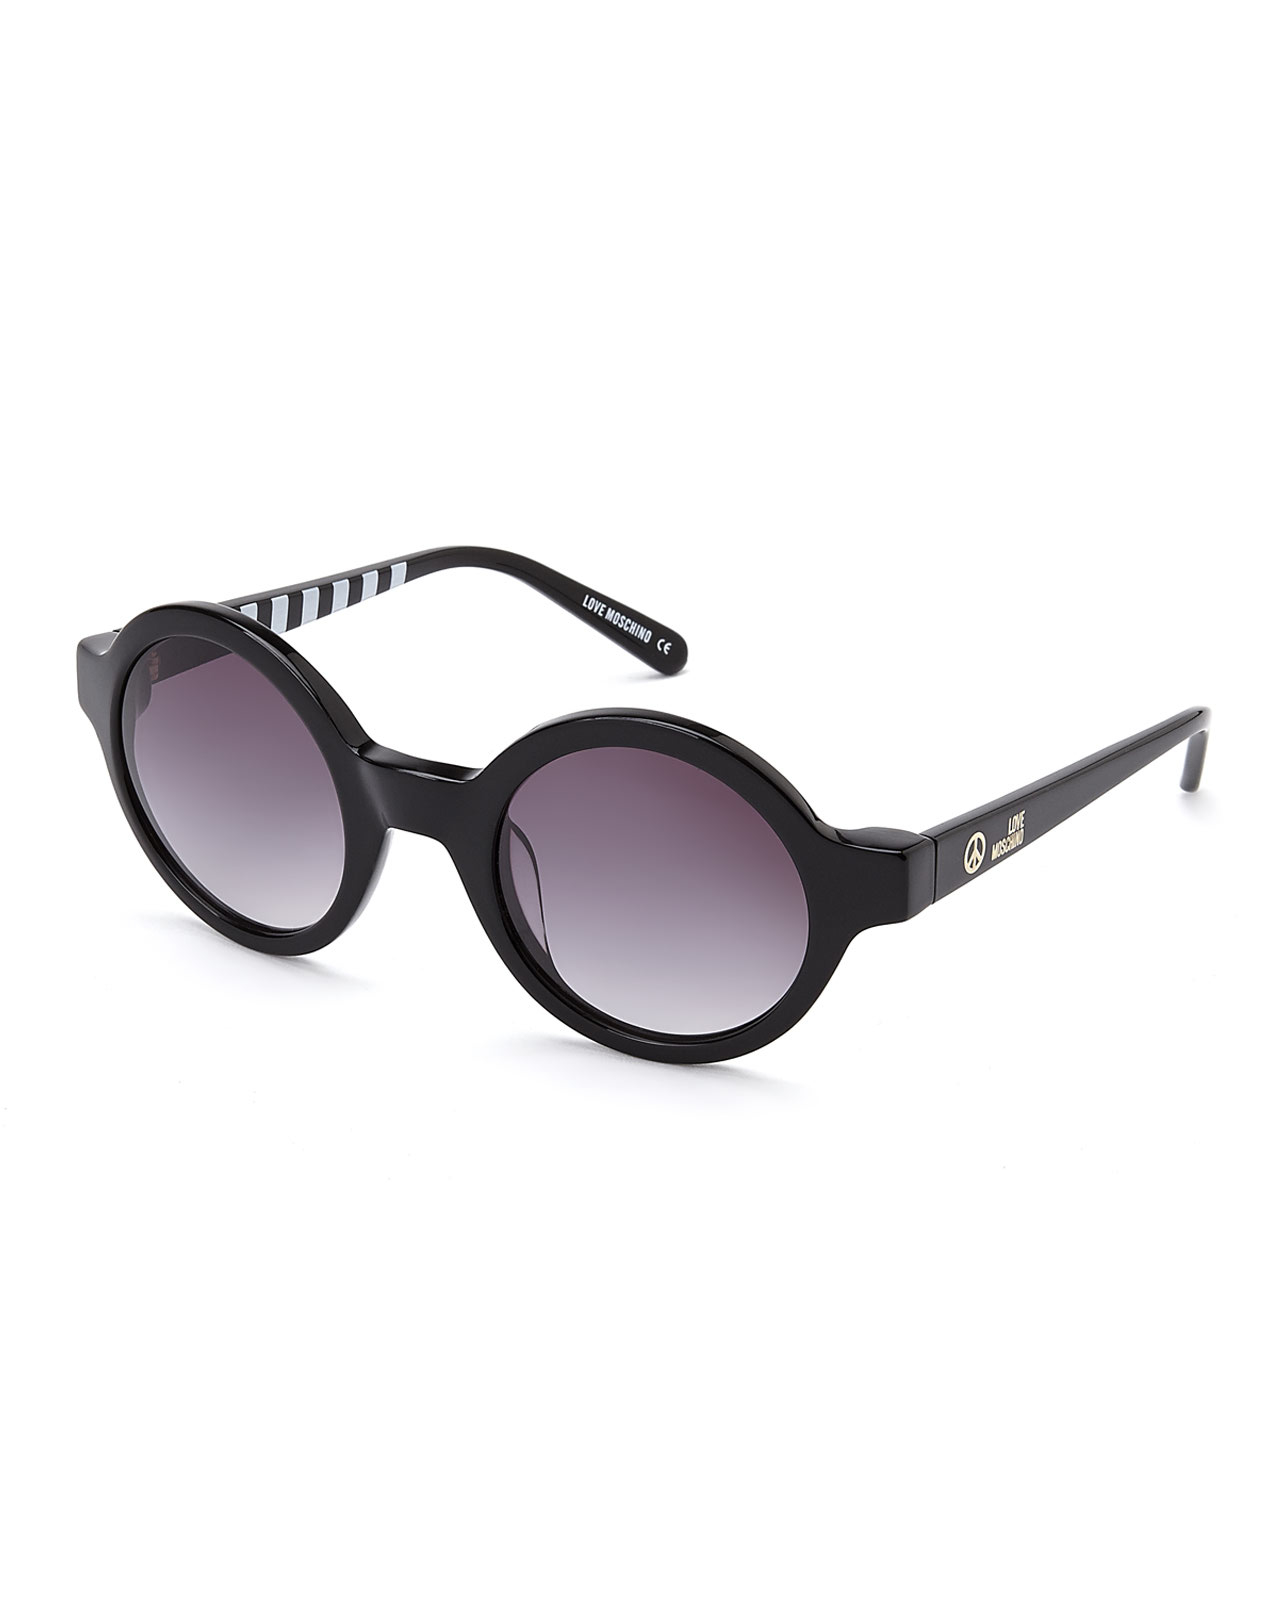 4c32fa9b0cc Lyst - Love Moschino Ml50101 Black Round Sunglasses in Black